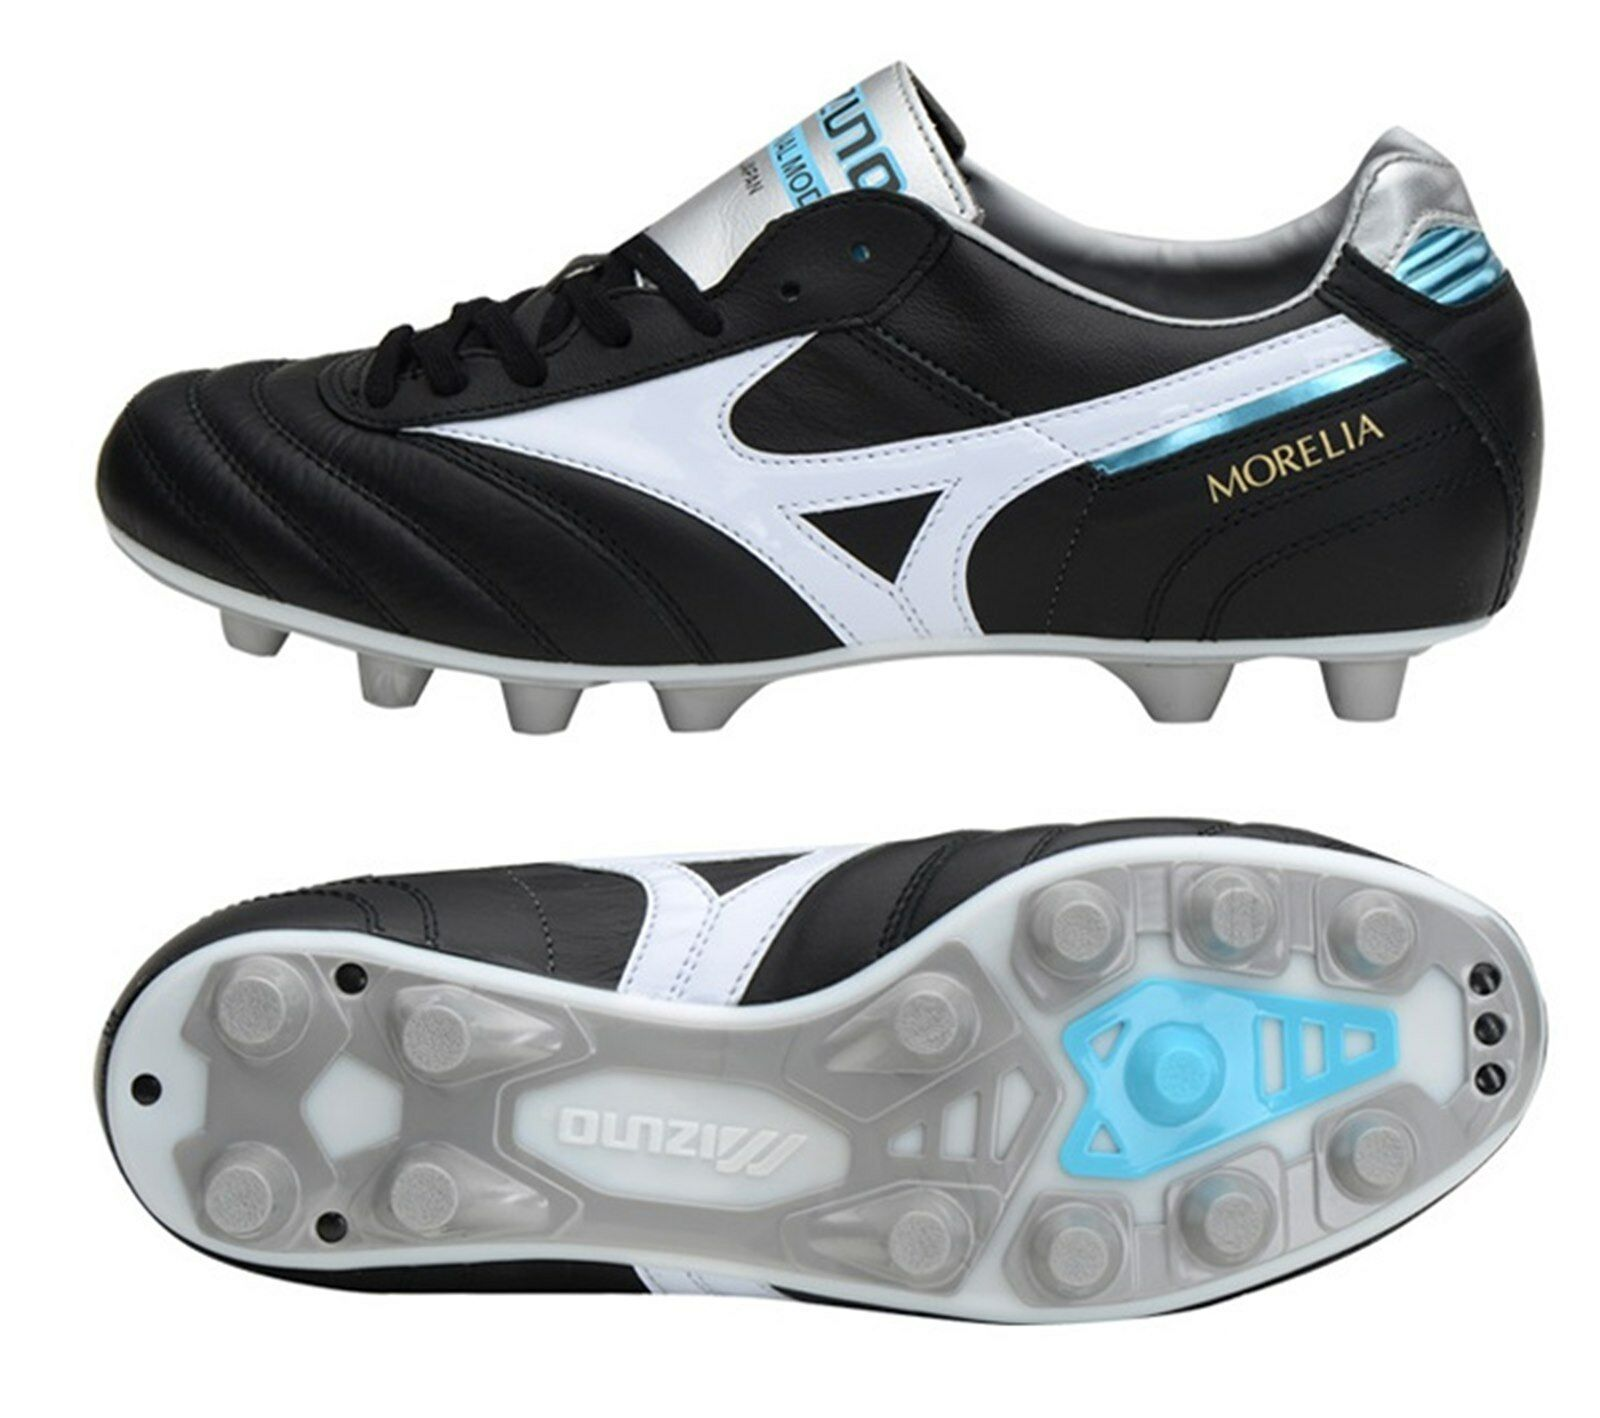 Mizuno Men Morelia II Neo JAPAN Cleats Soccer Football Schuhes Spike P1GA180102